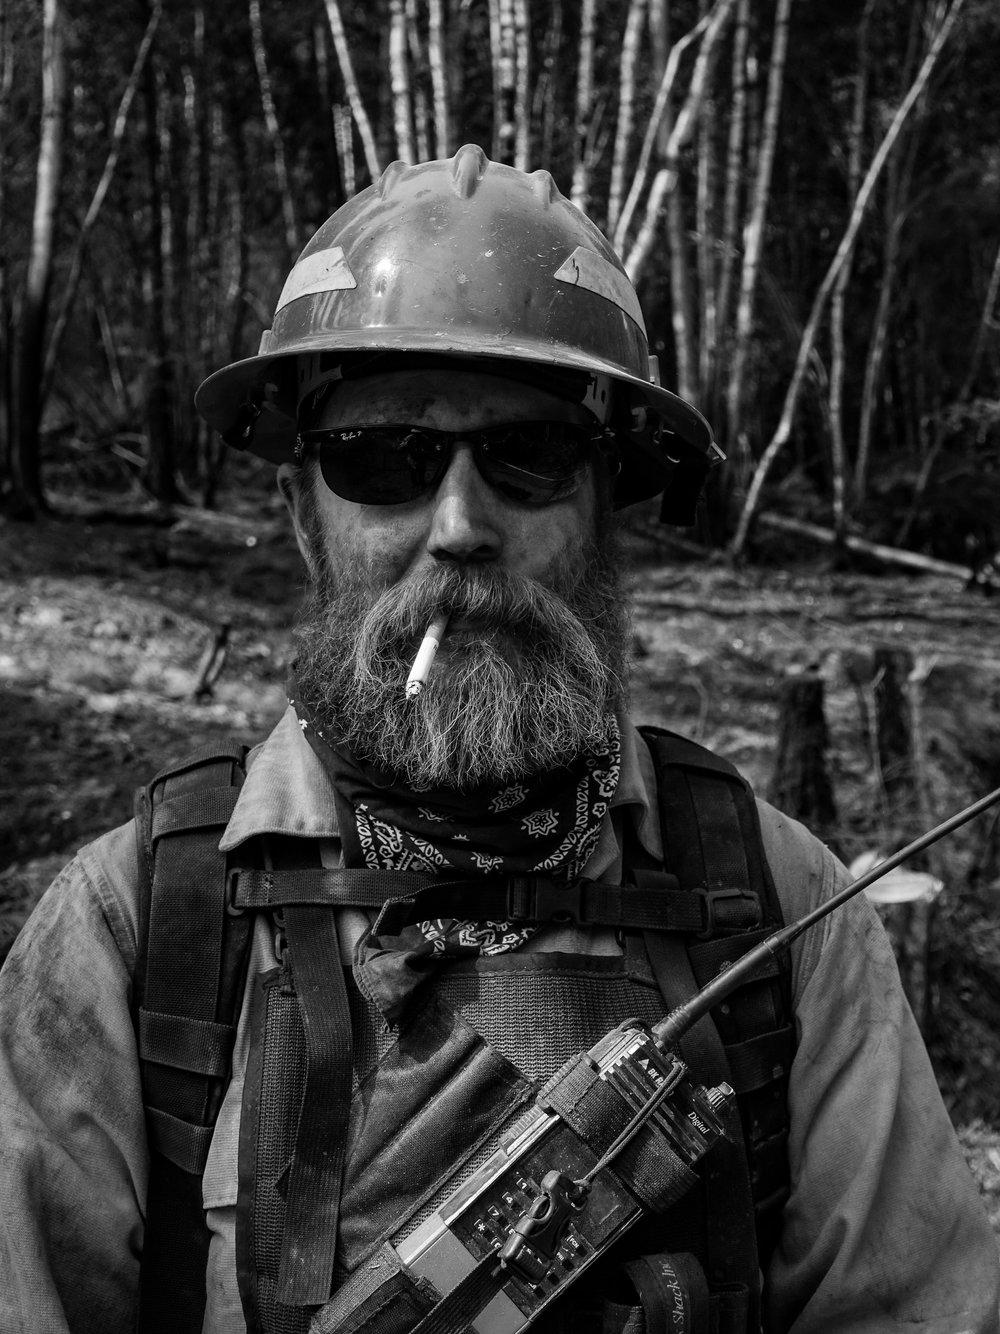 Robert LeBlanc_ Forest Fire image 17.jpg